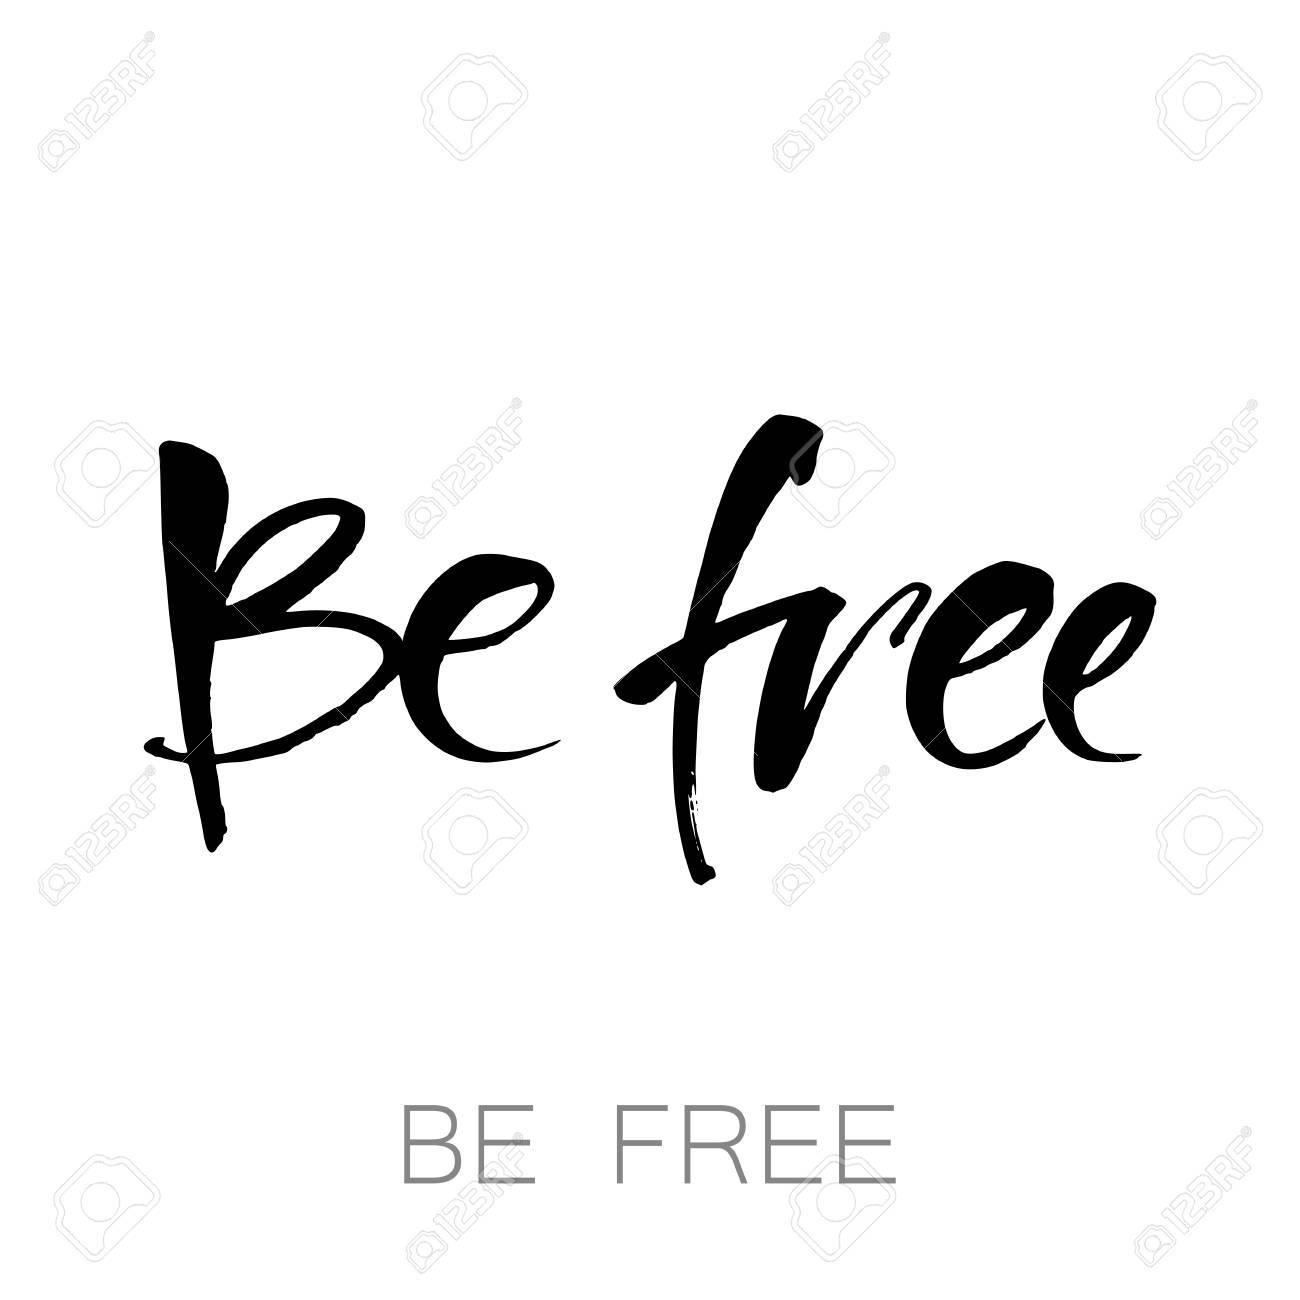 be free.jpg